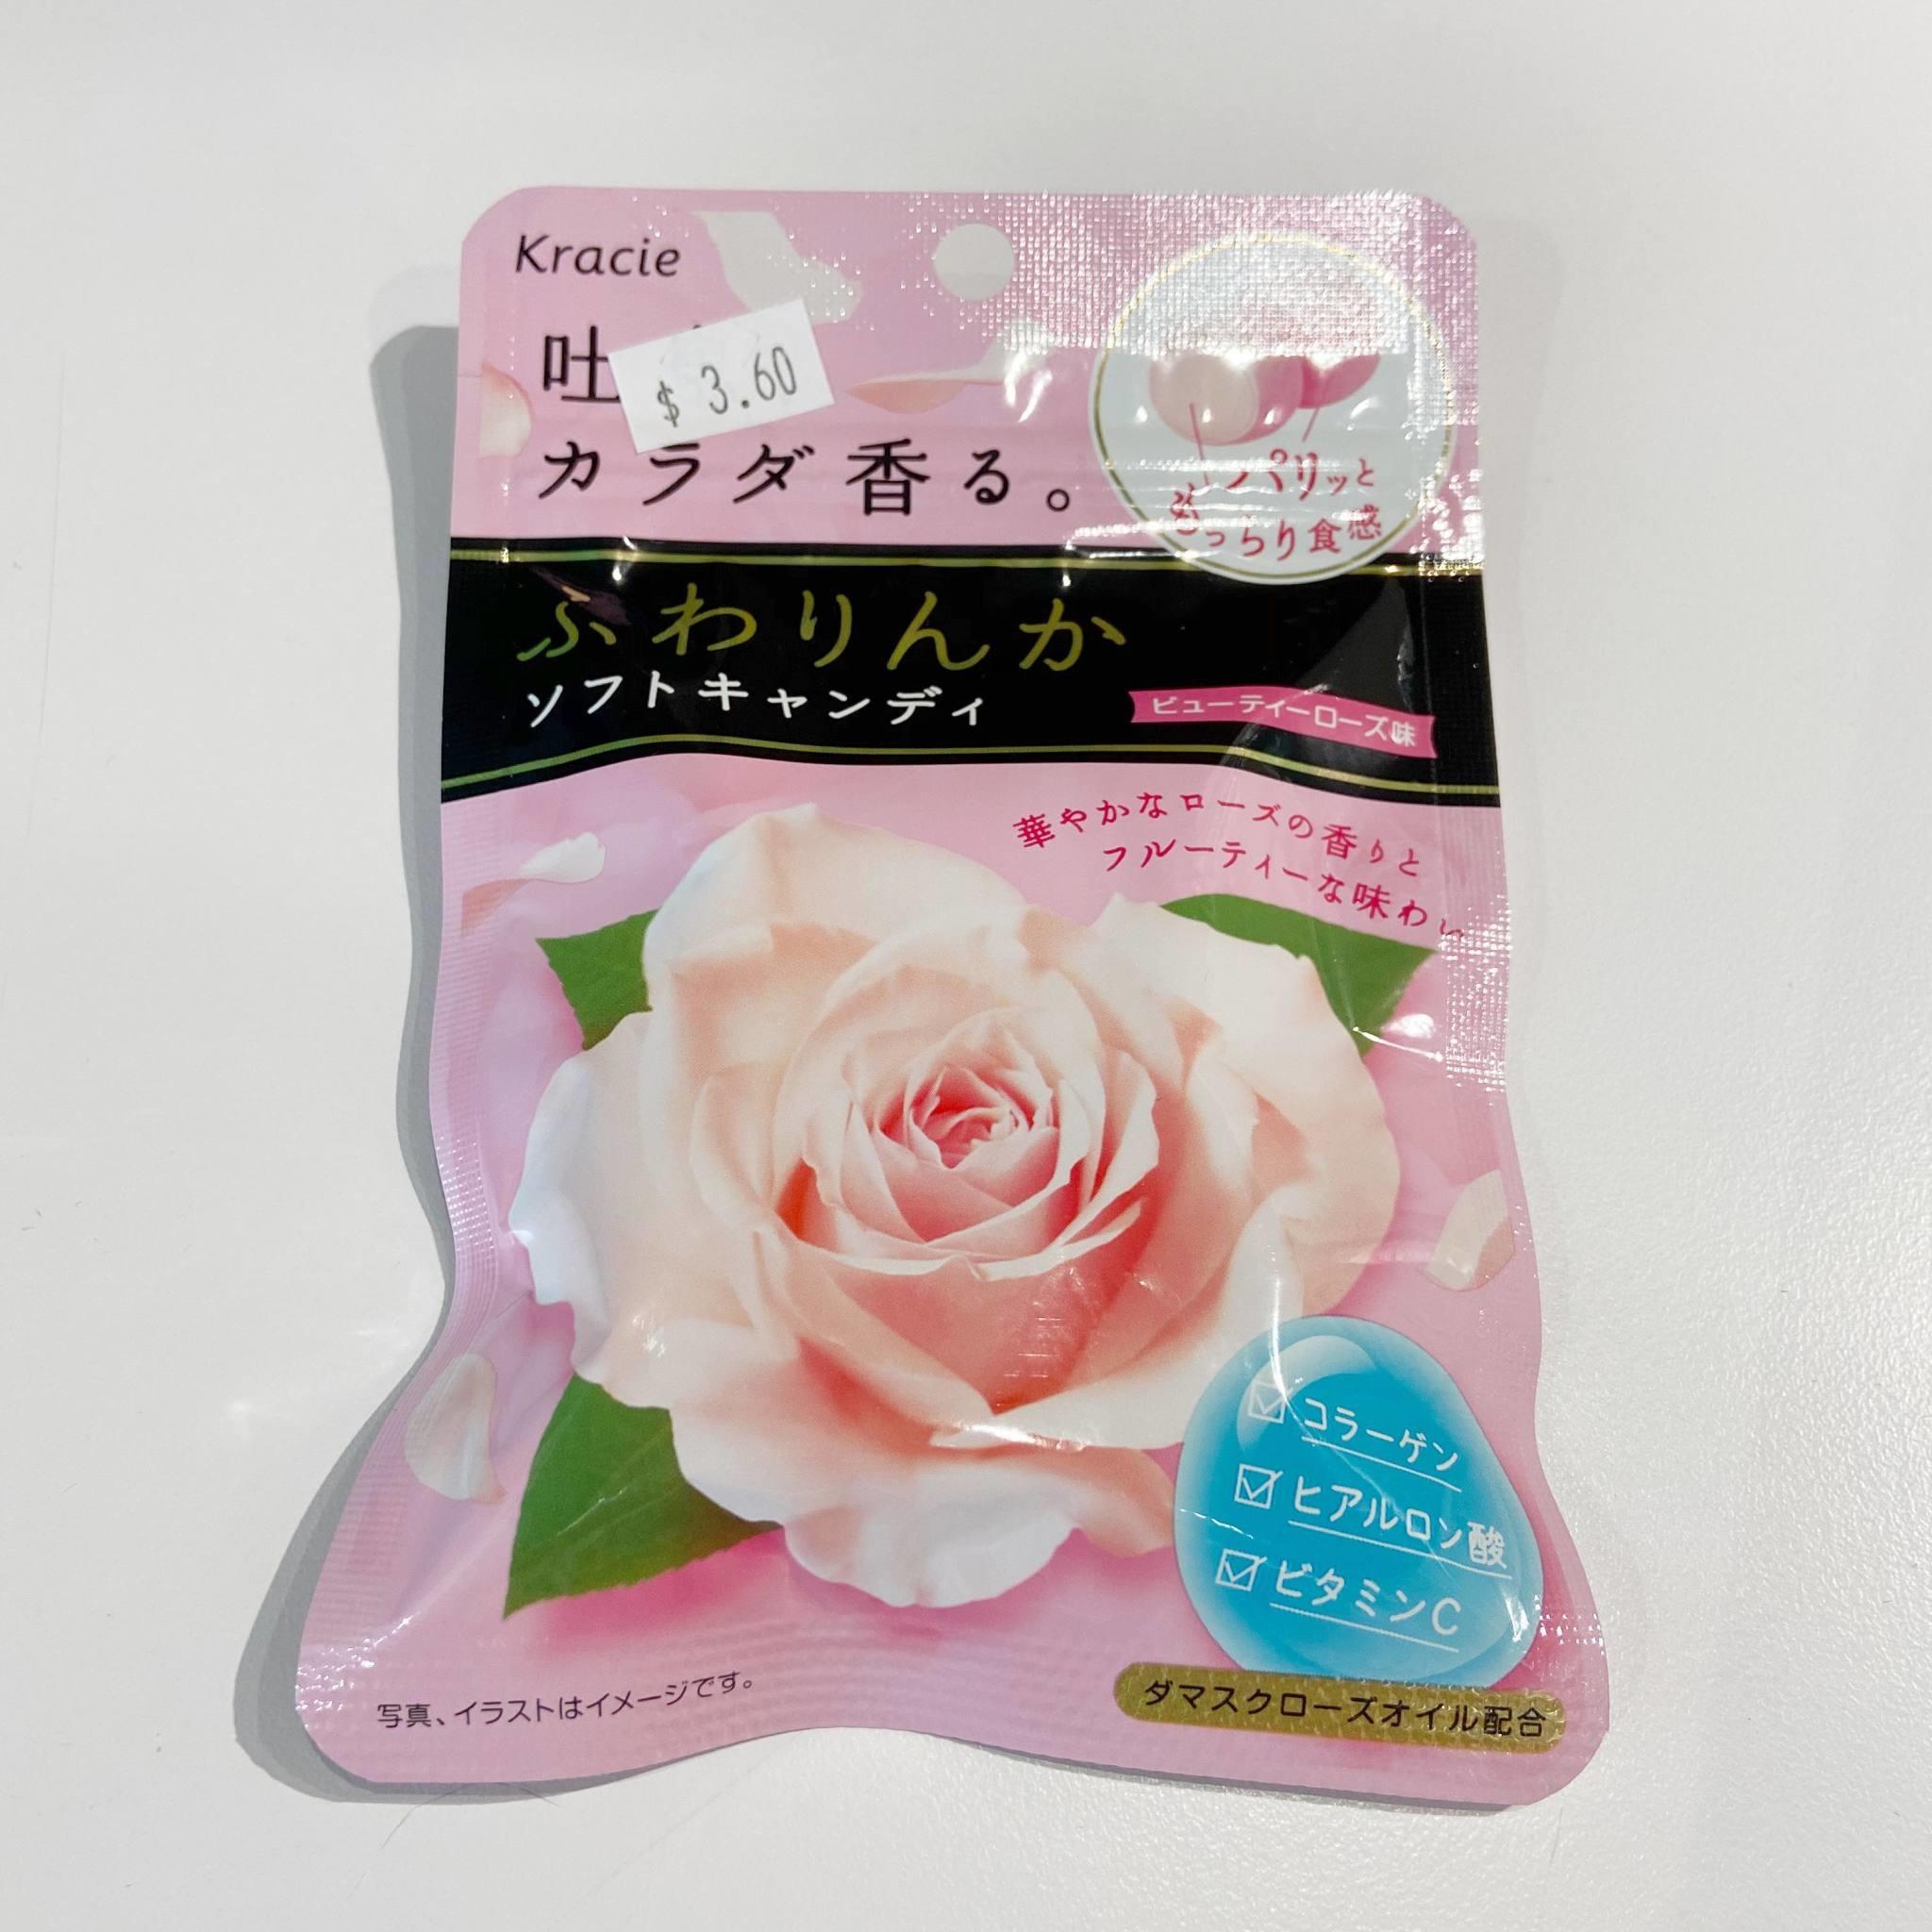 Kracie Rose Candy